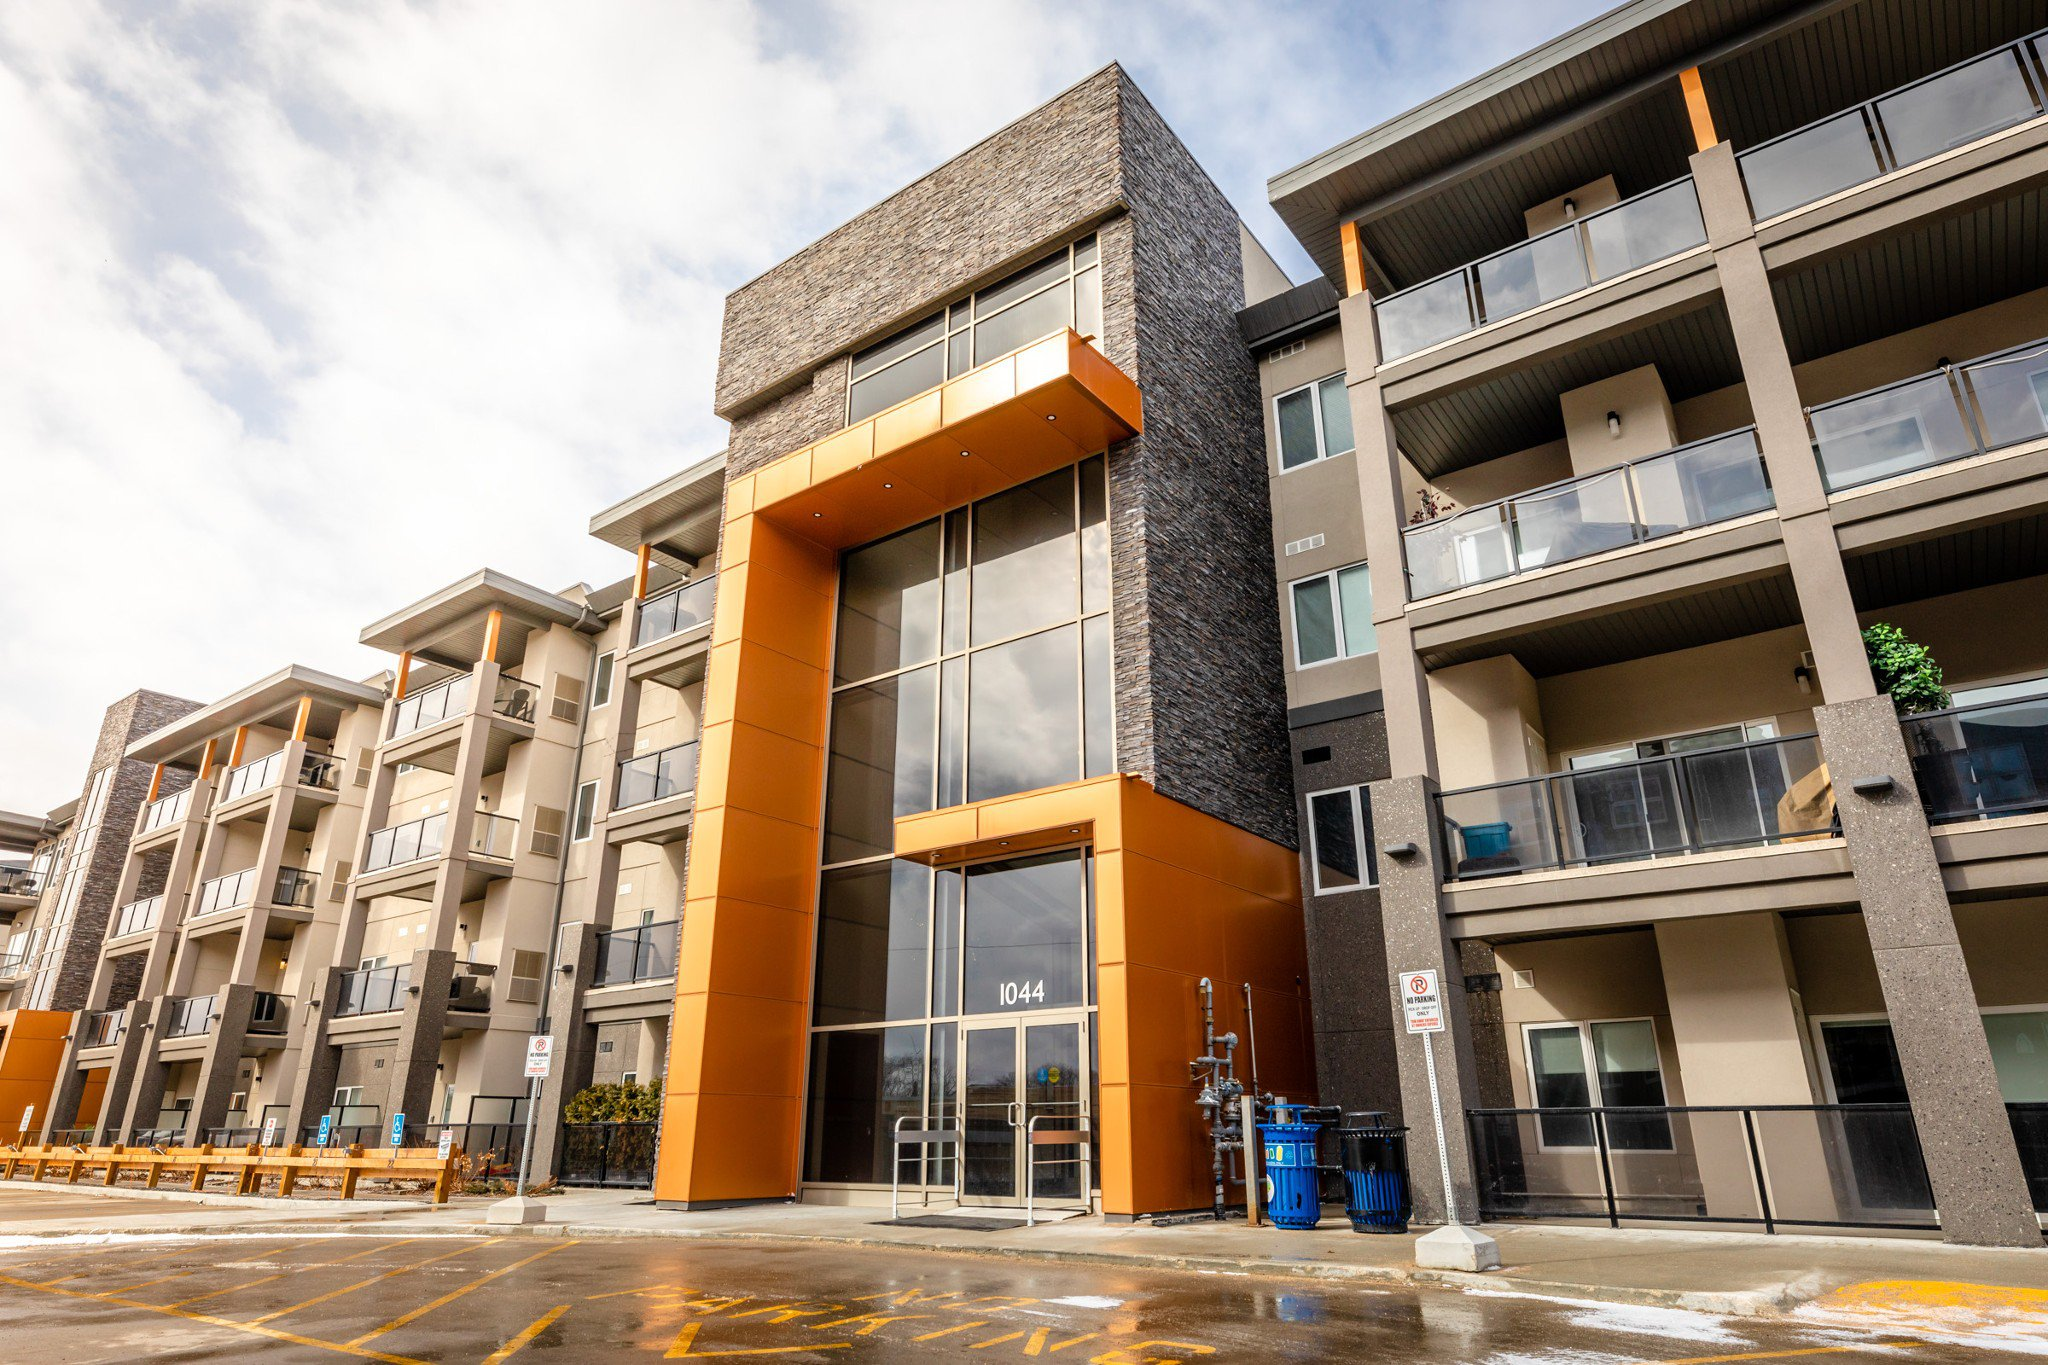 Main Photo: 216 1044 Wilkes Avenue in Winnipeg: Condominium for rent (Linden Woods)